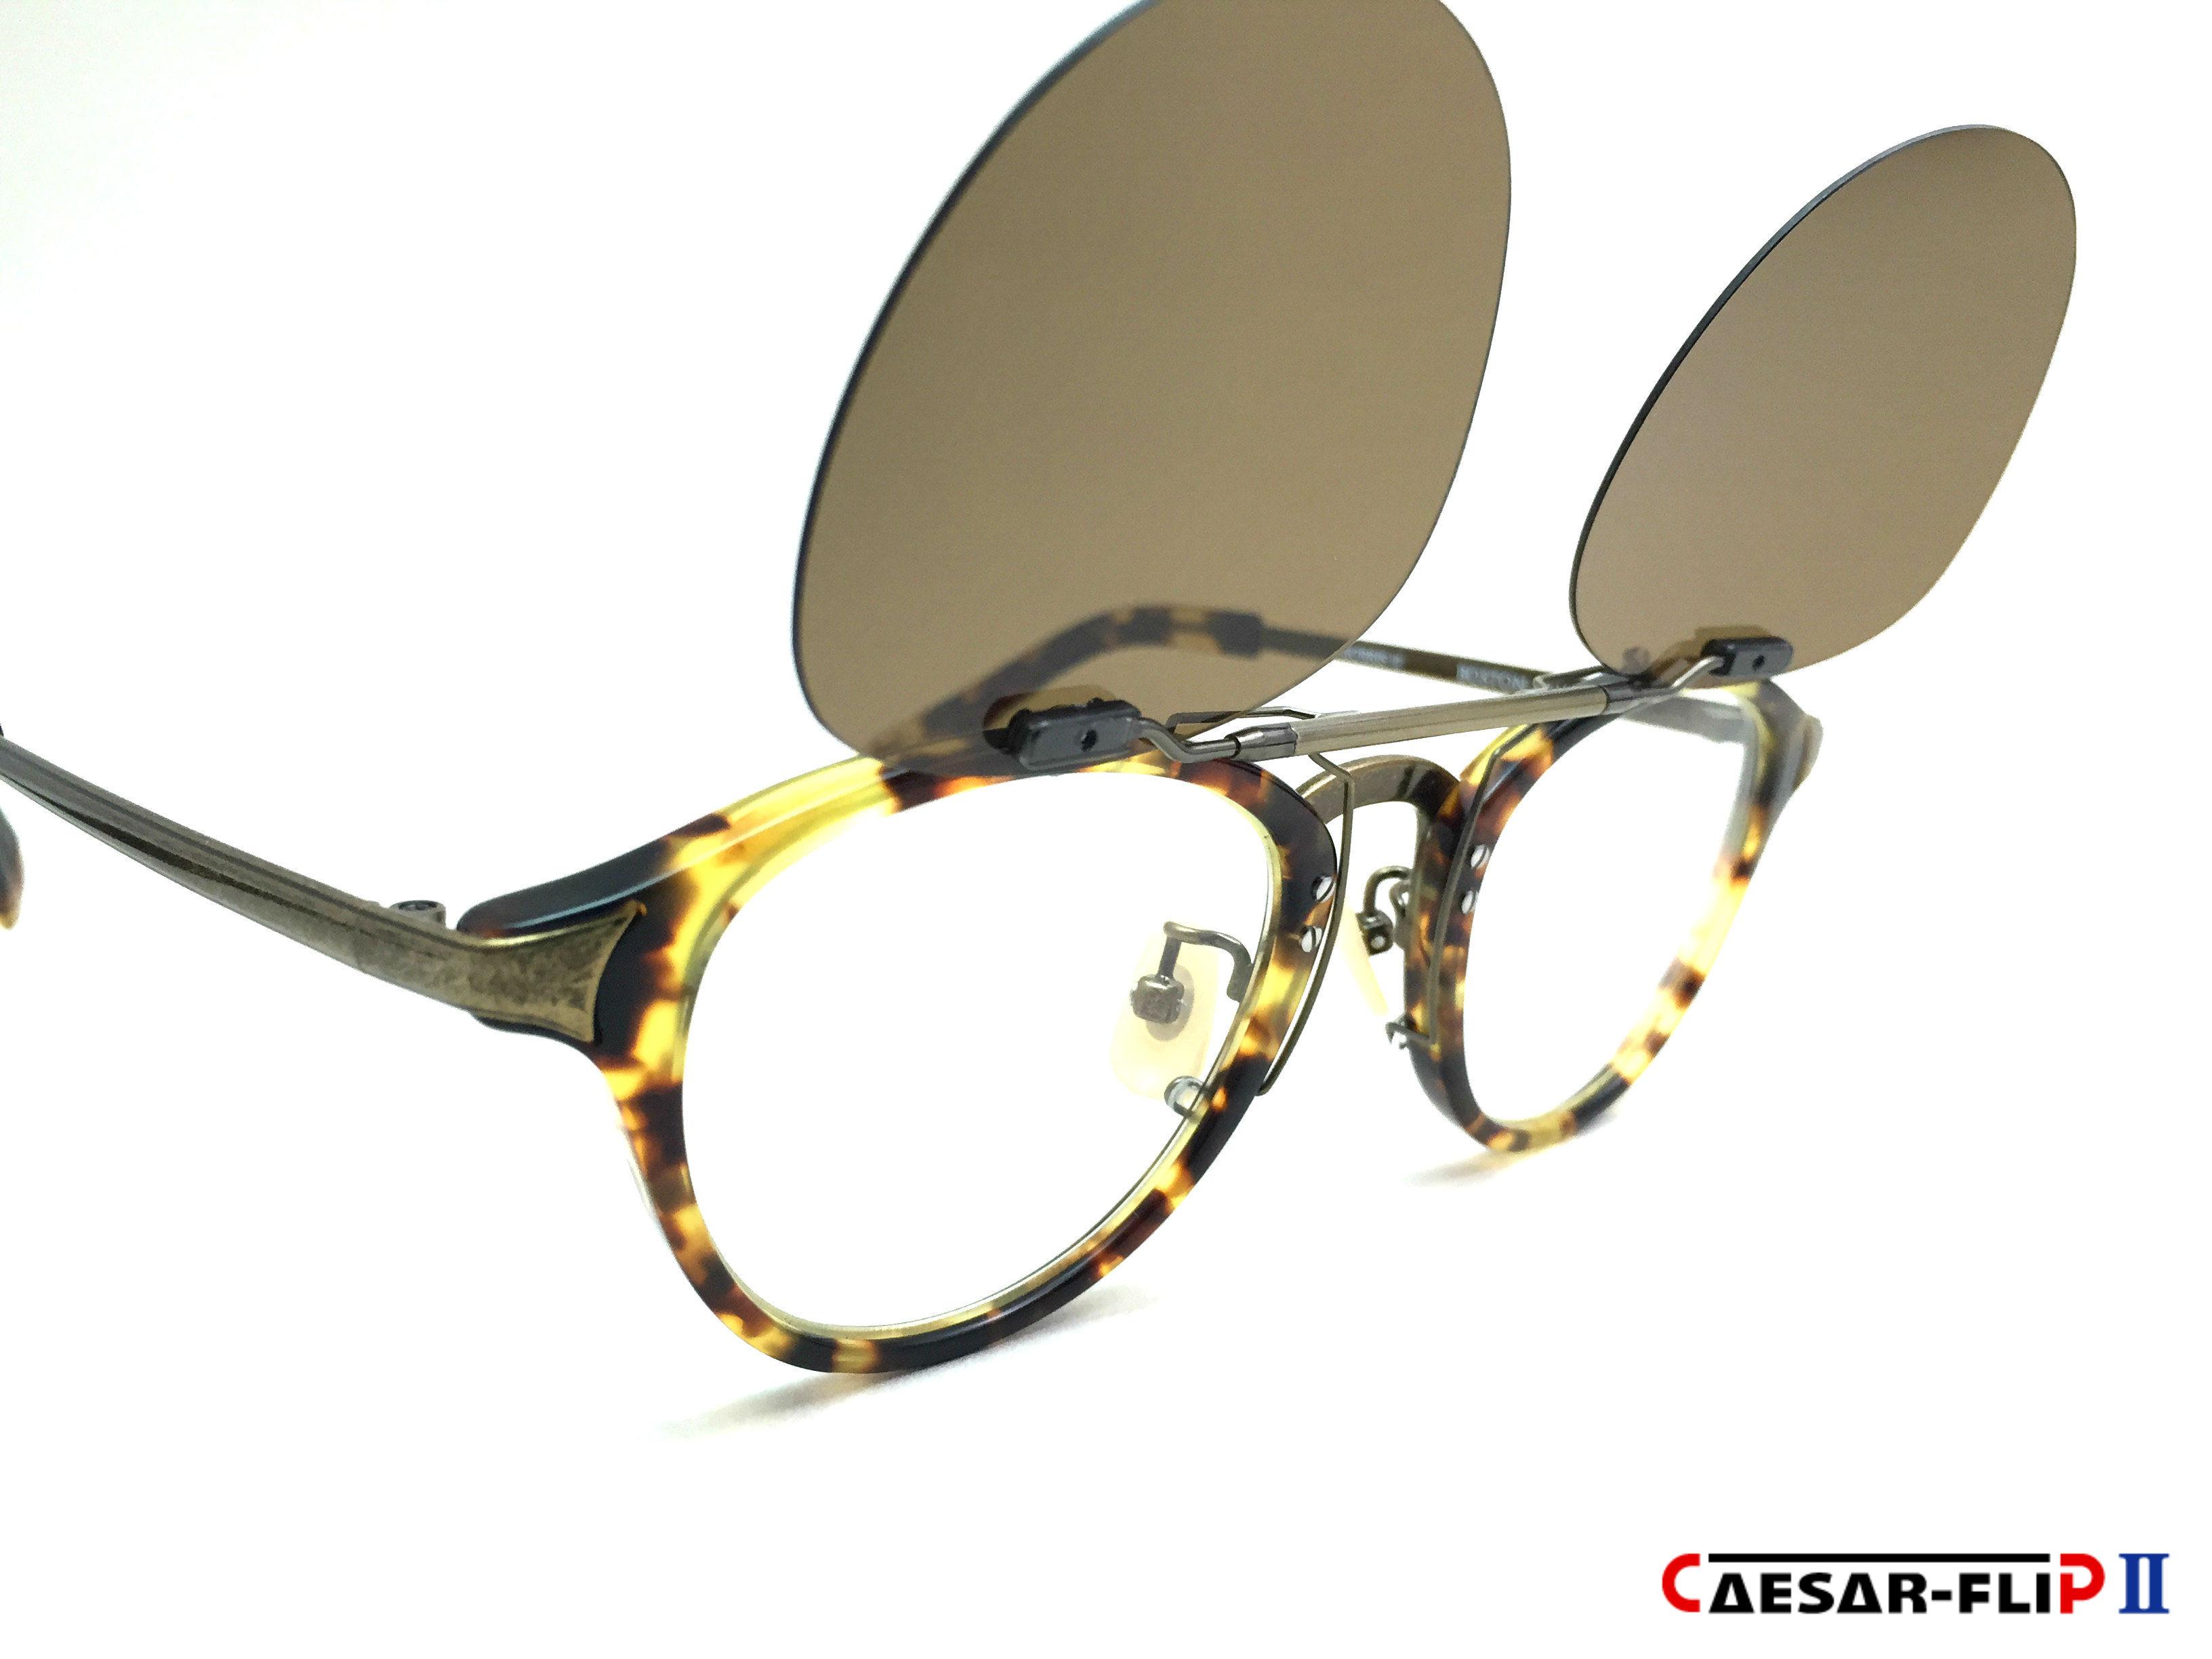 CAESAR-FLIP II